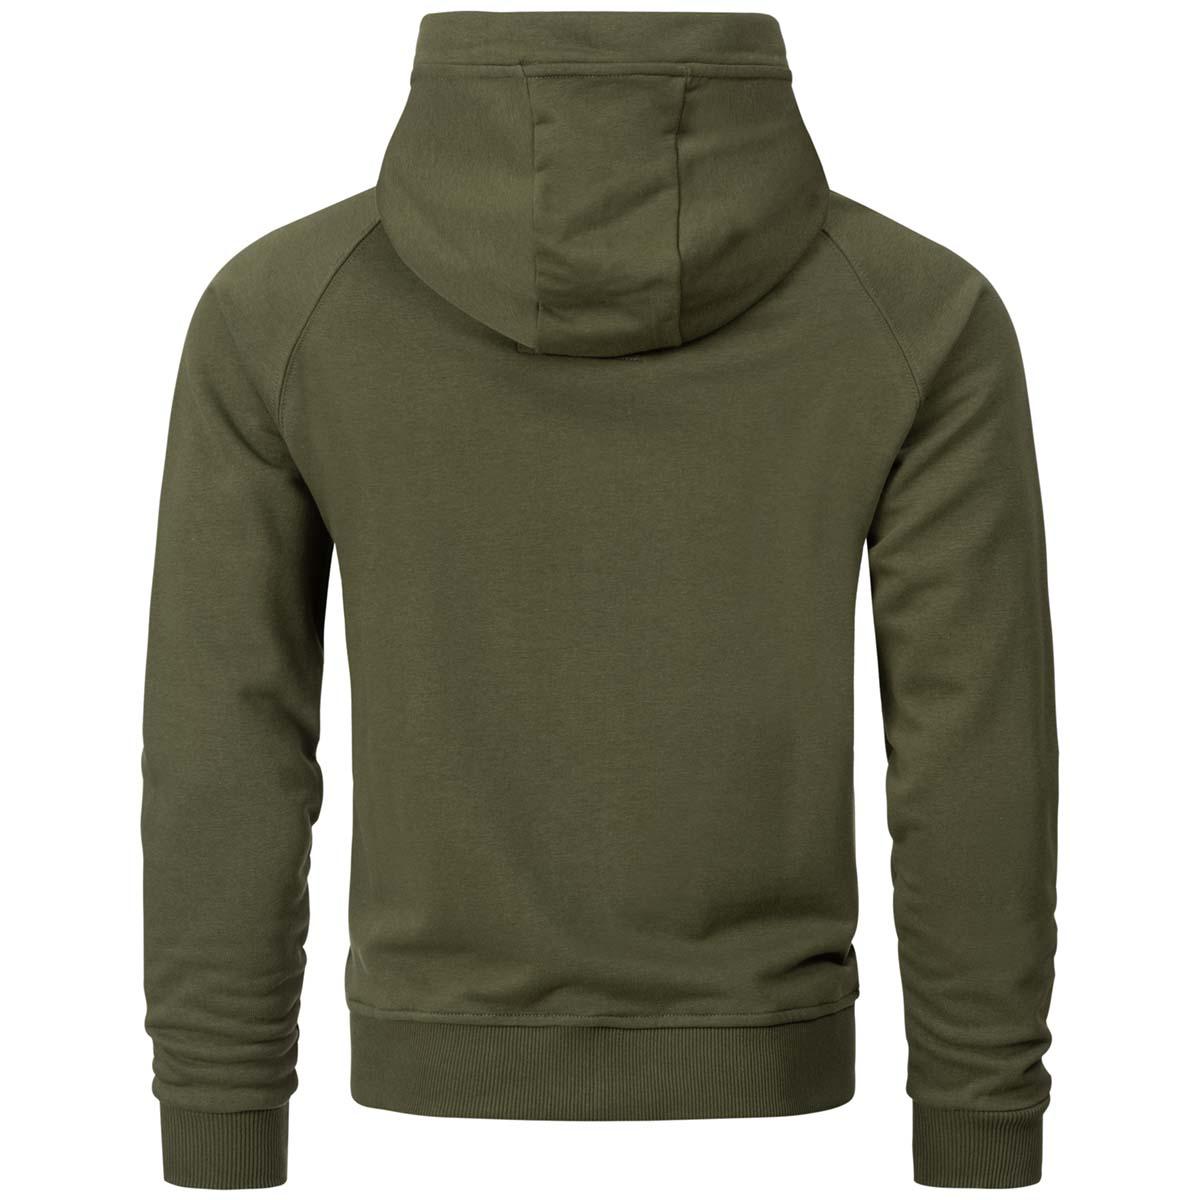 A-Salvarini-Herren-Sweatjacke-Kapuzenpullover-Jacke-Kapuze-Hoodie-Sweater-AS192 Indexbild 30